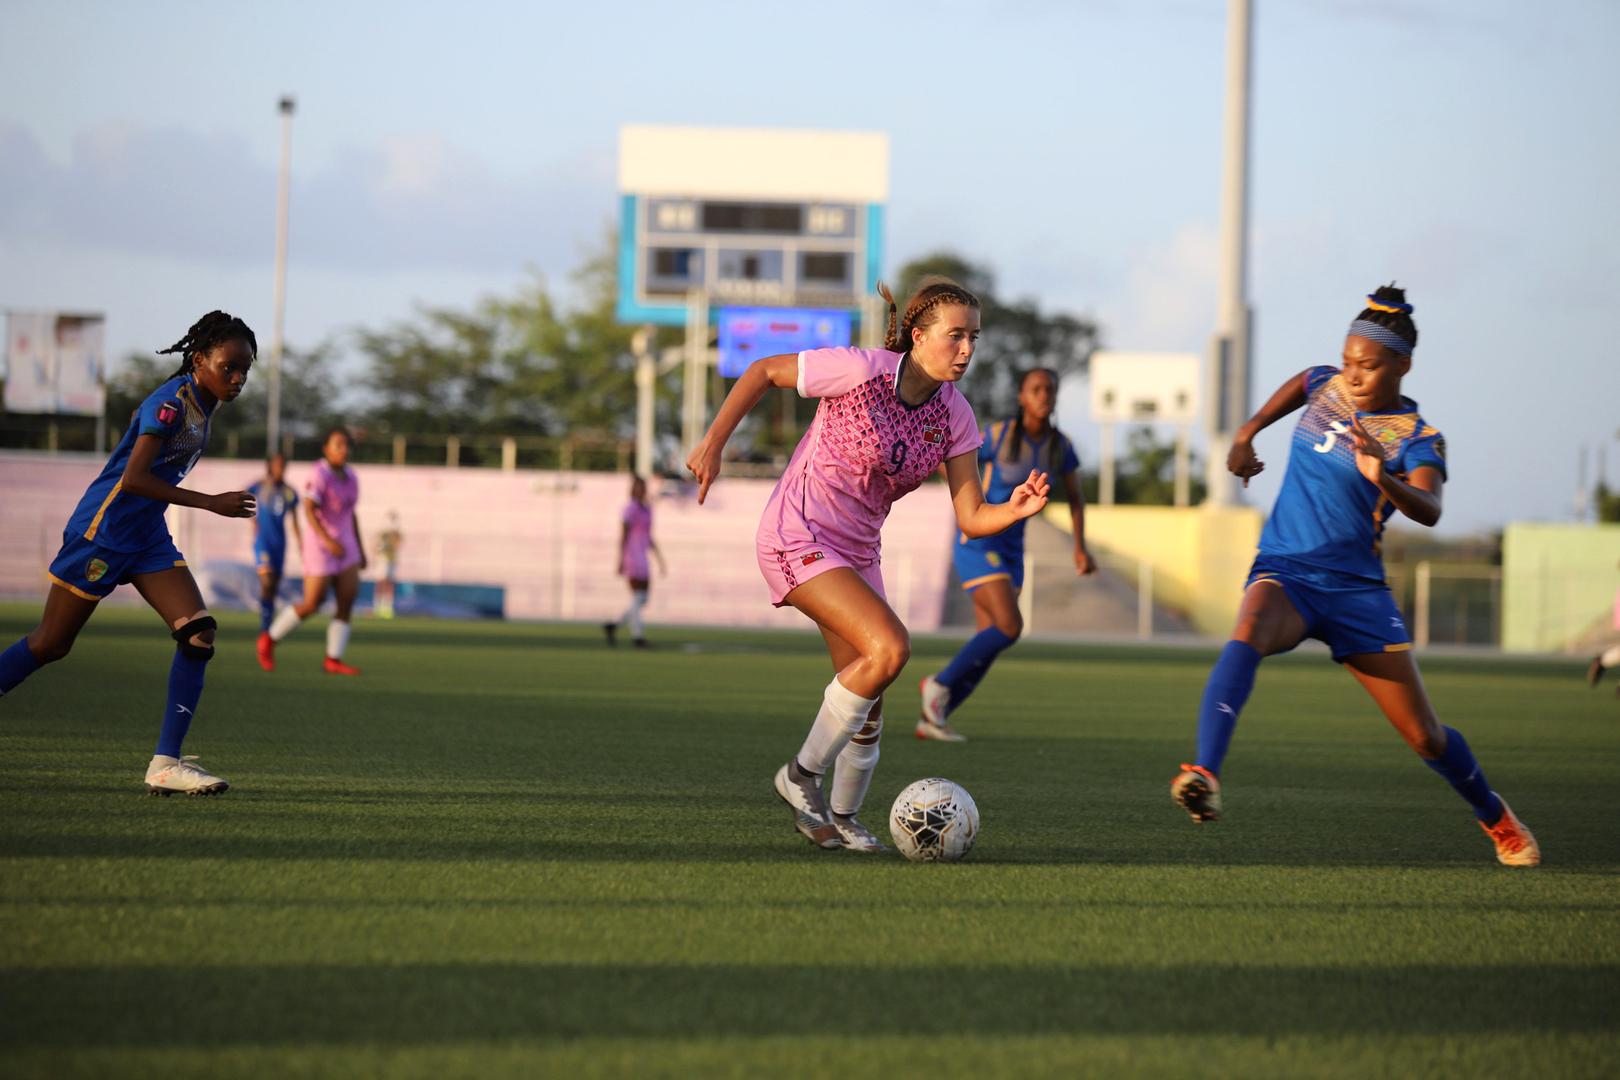 Bermuda, Cayman Islands advance to 2022 CWU20 Championship